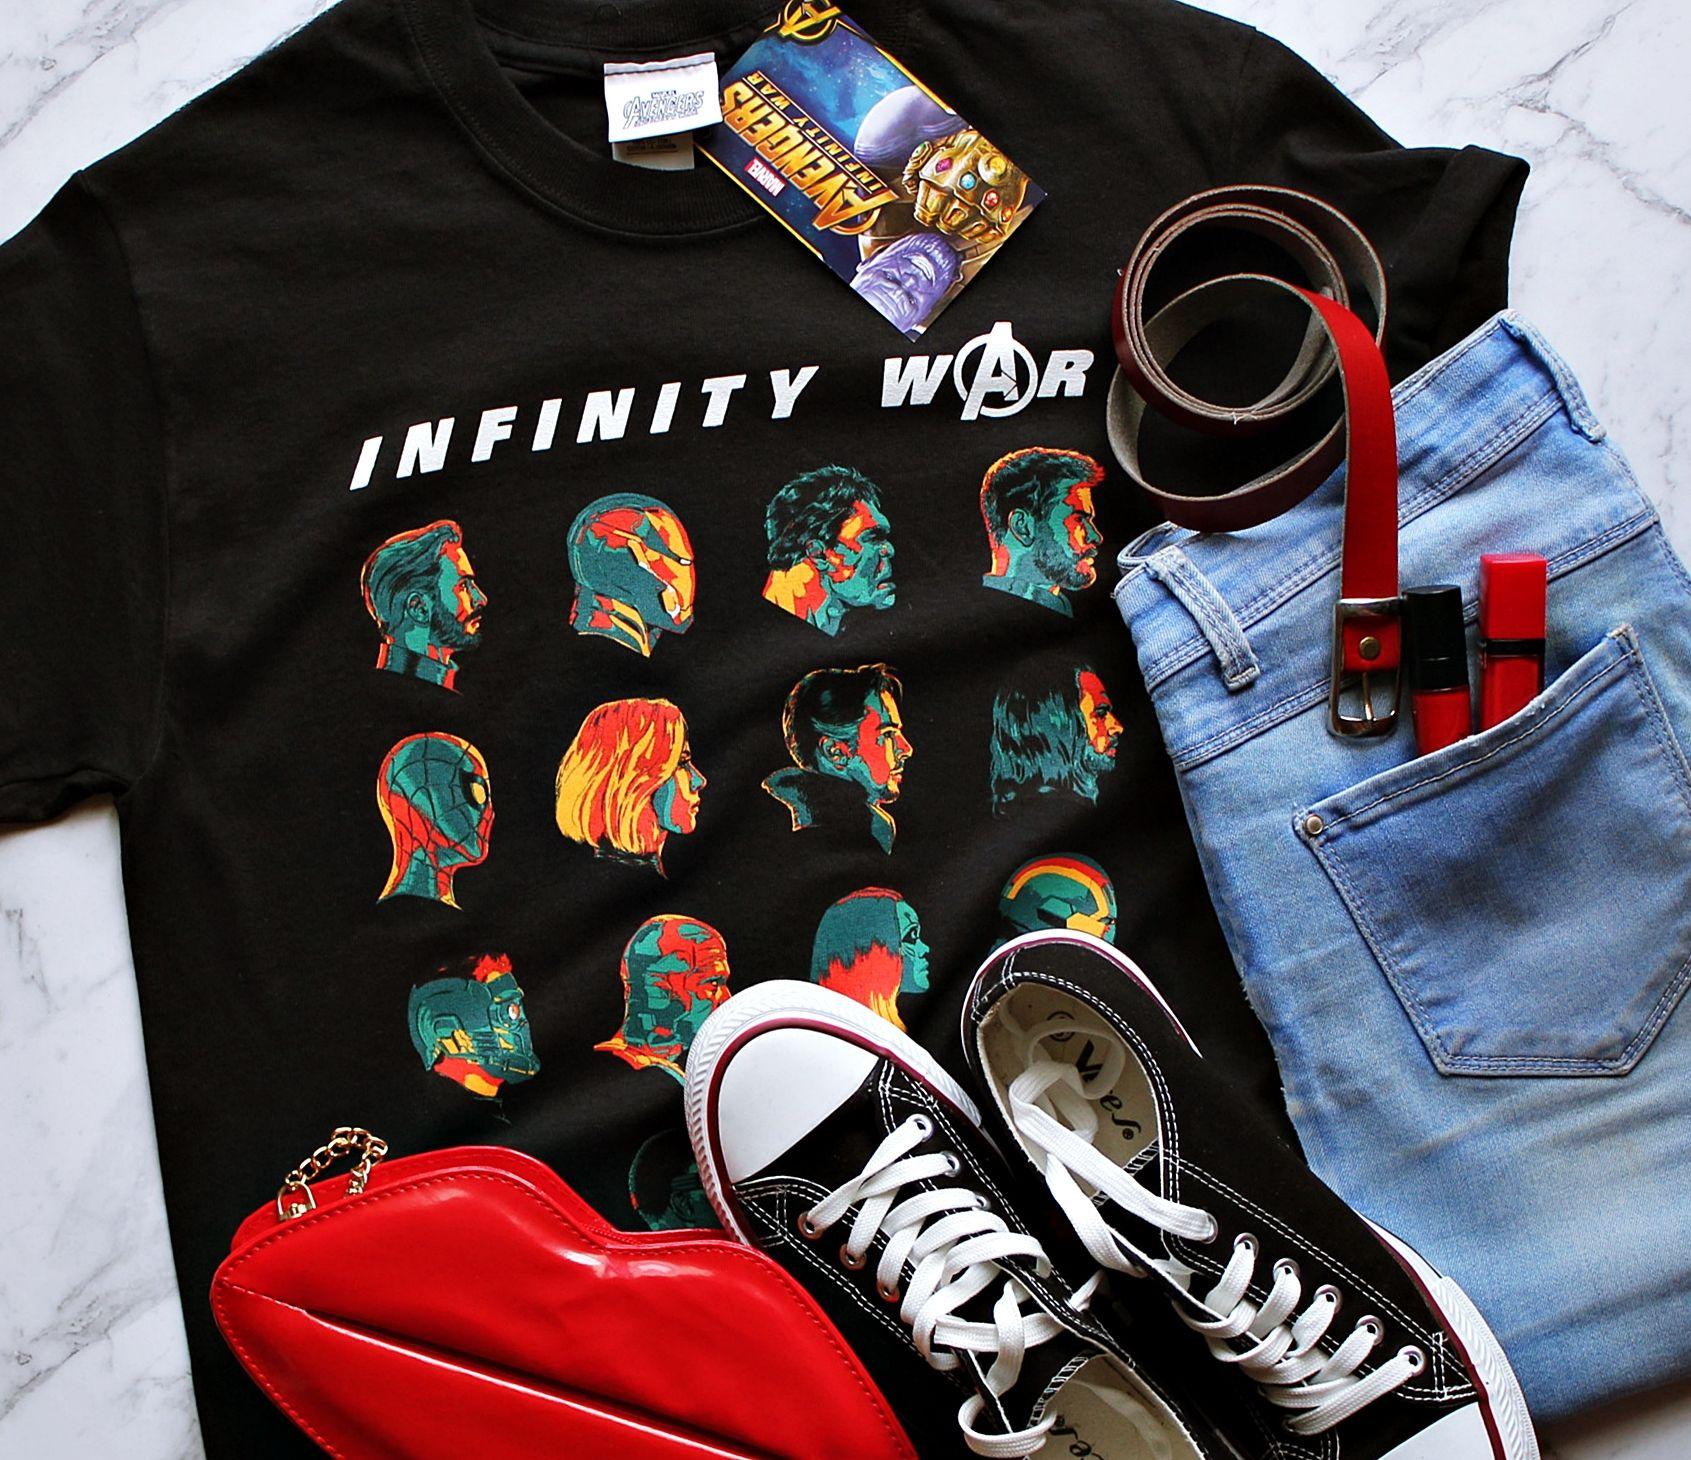 d3d985768 Bluzka marvel z nadrukiem AVENGERS INFINITY WAR - komiksowa koszulka z  marvela z superbohaterami. Koszulka